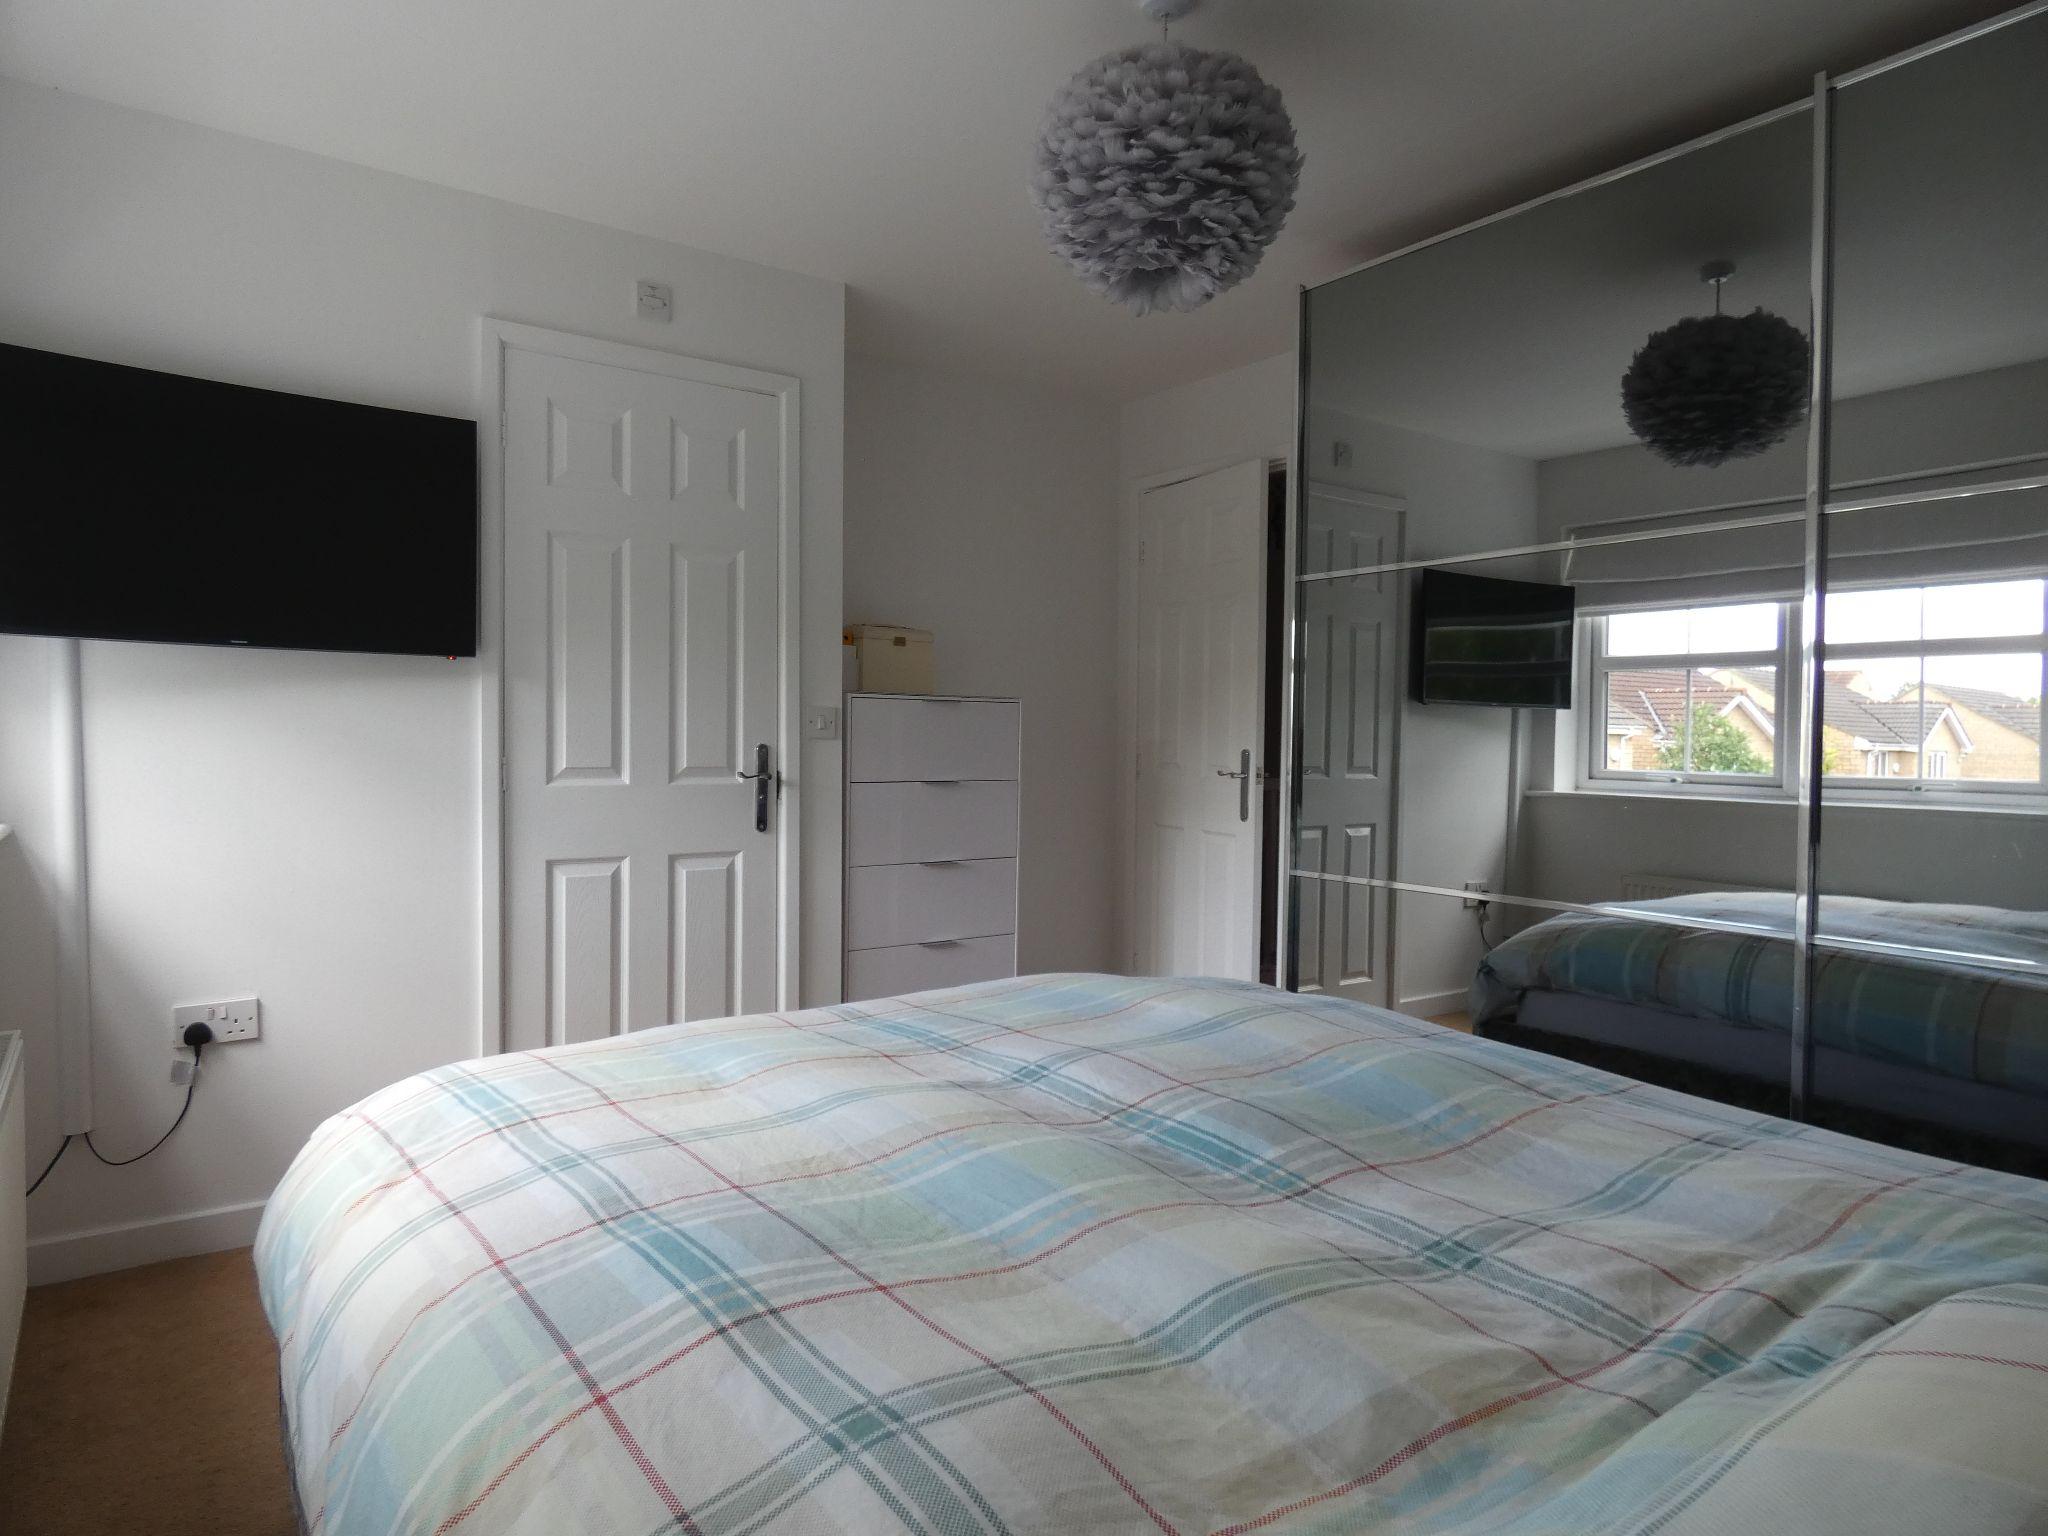 3 bedroom semi-detached house For Sale in Bishop Auckland - Bedroom One.